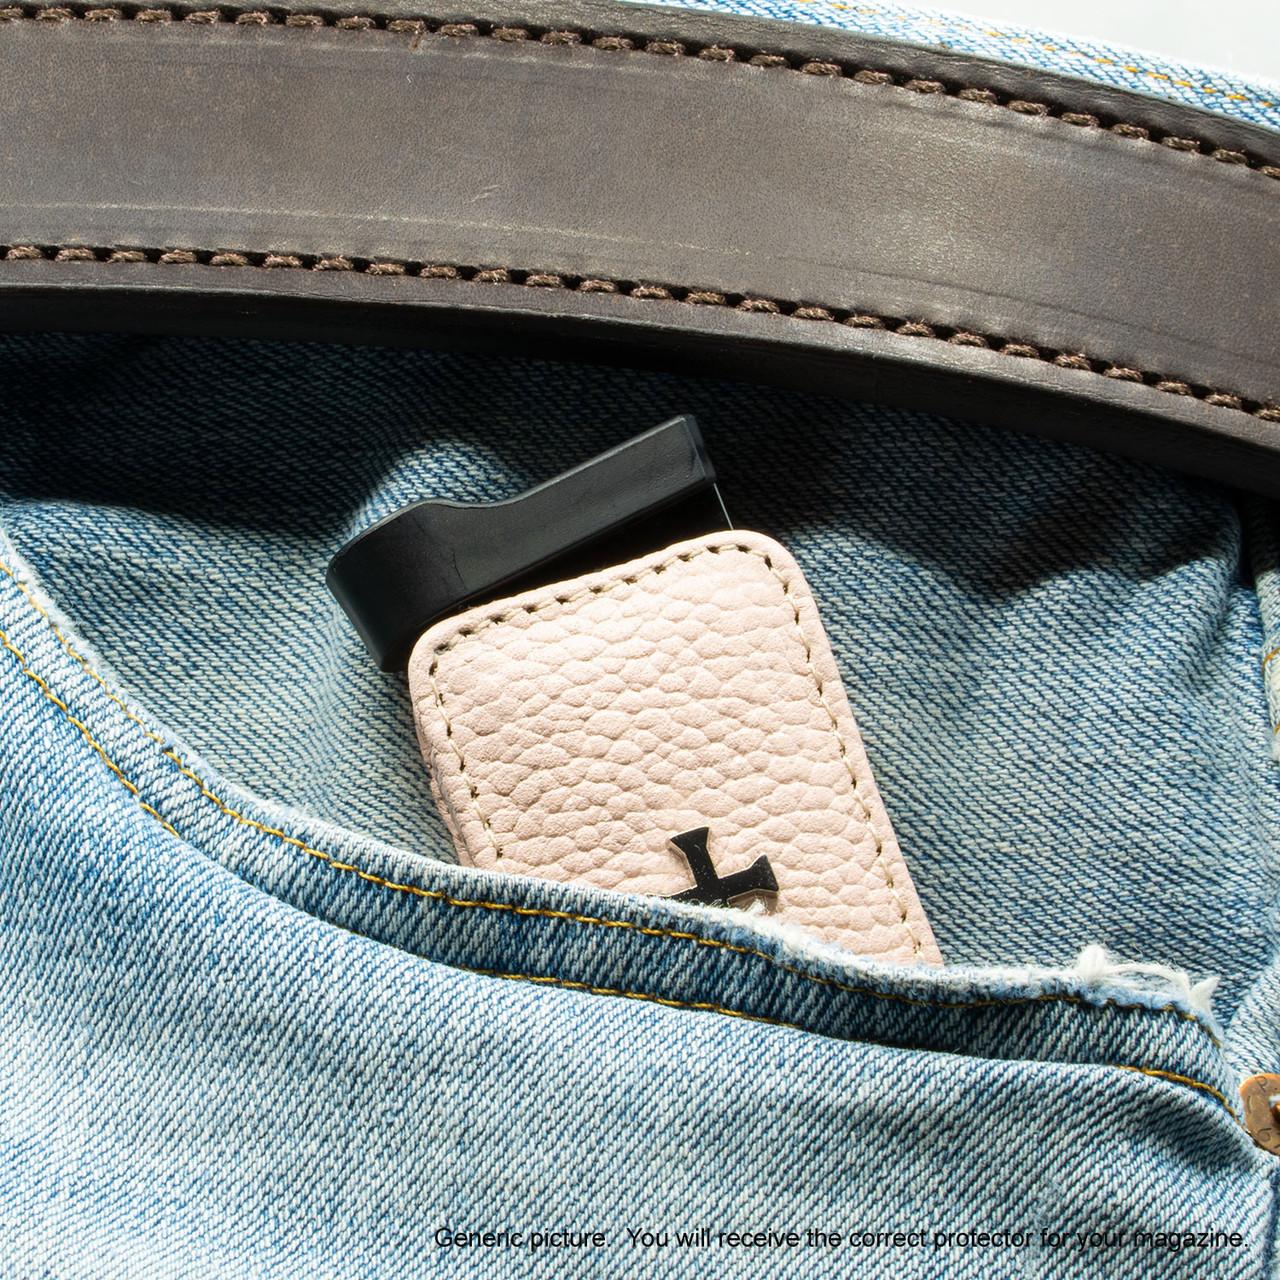 CZ P-10 C Pink Carry Faithfully Cross Magazine Pocket Protector